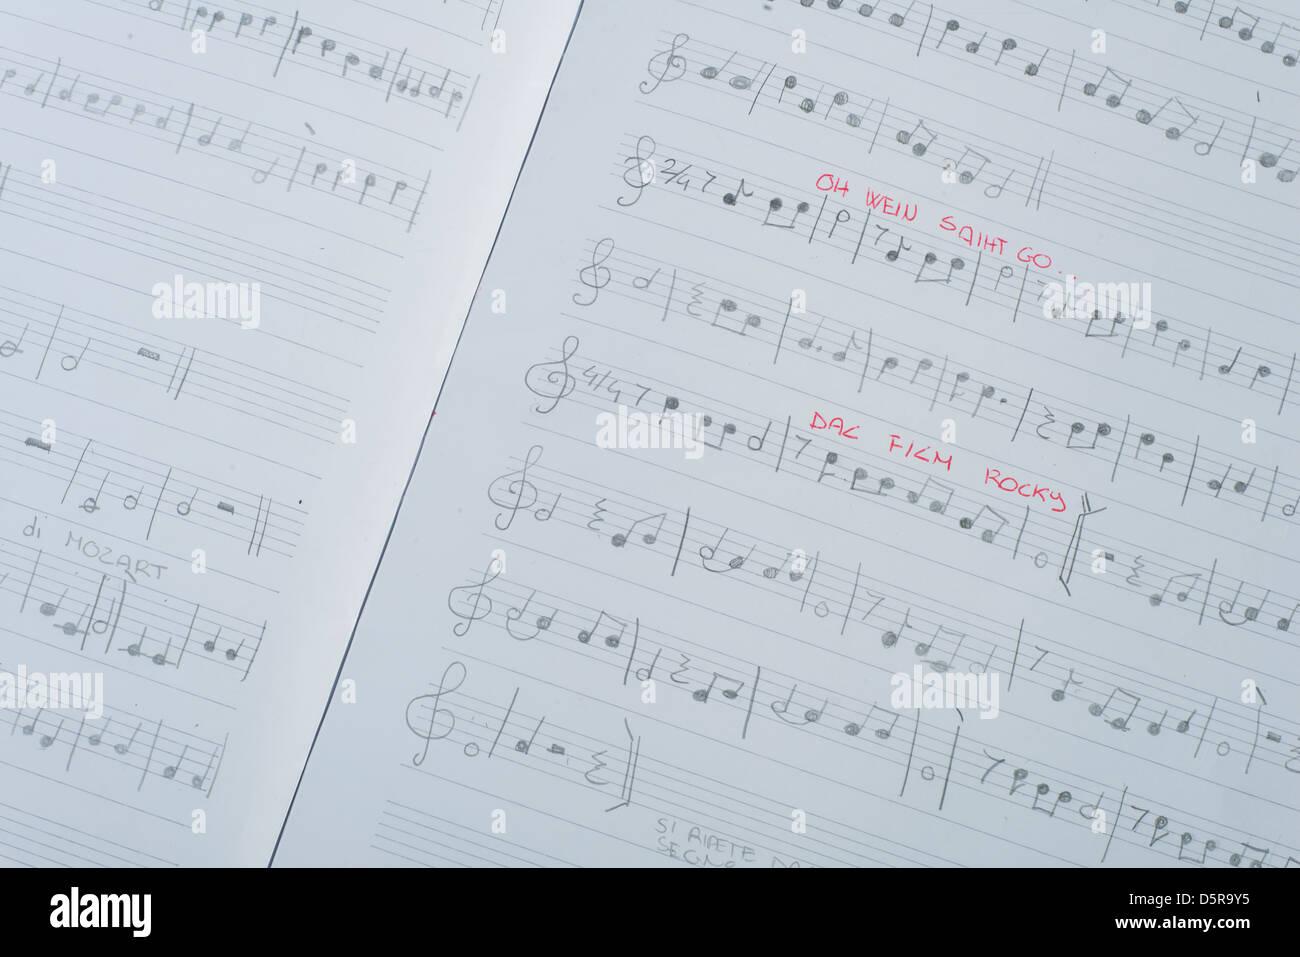 Write Sheet Music Stock Photos & Write Sheet Music Stock Images - Alamy